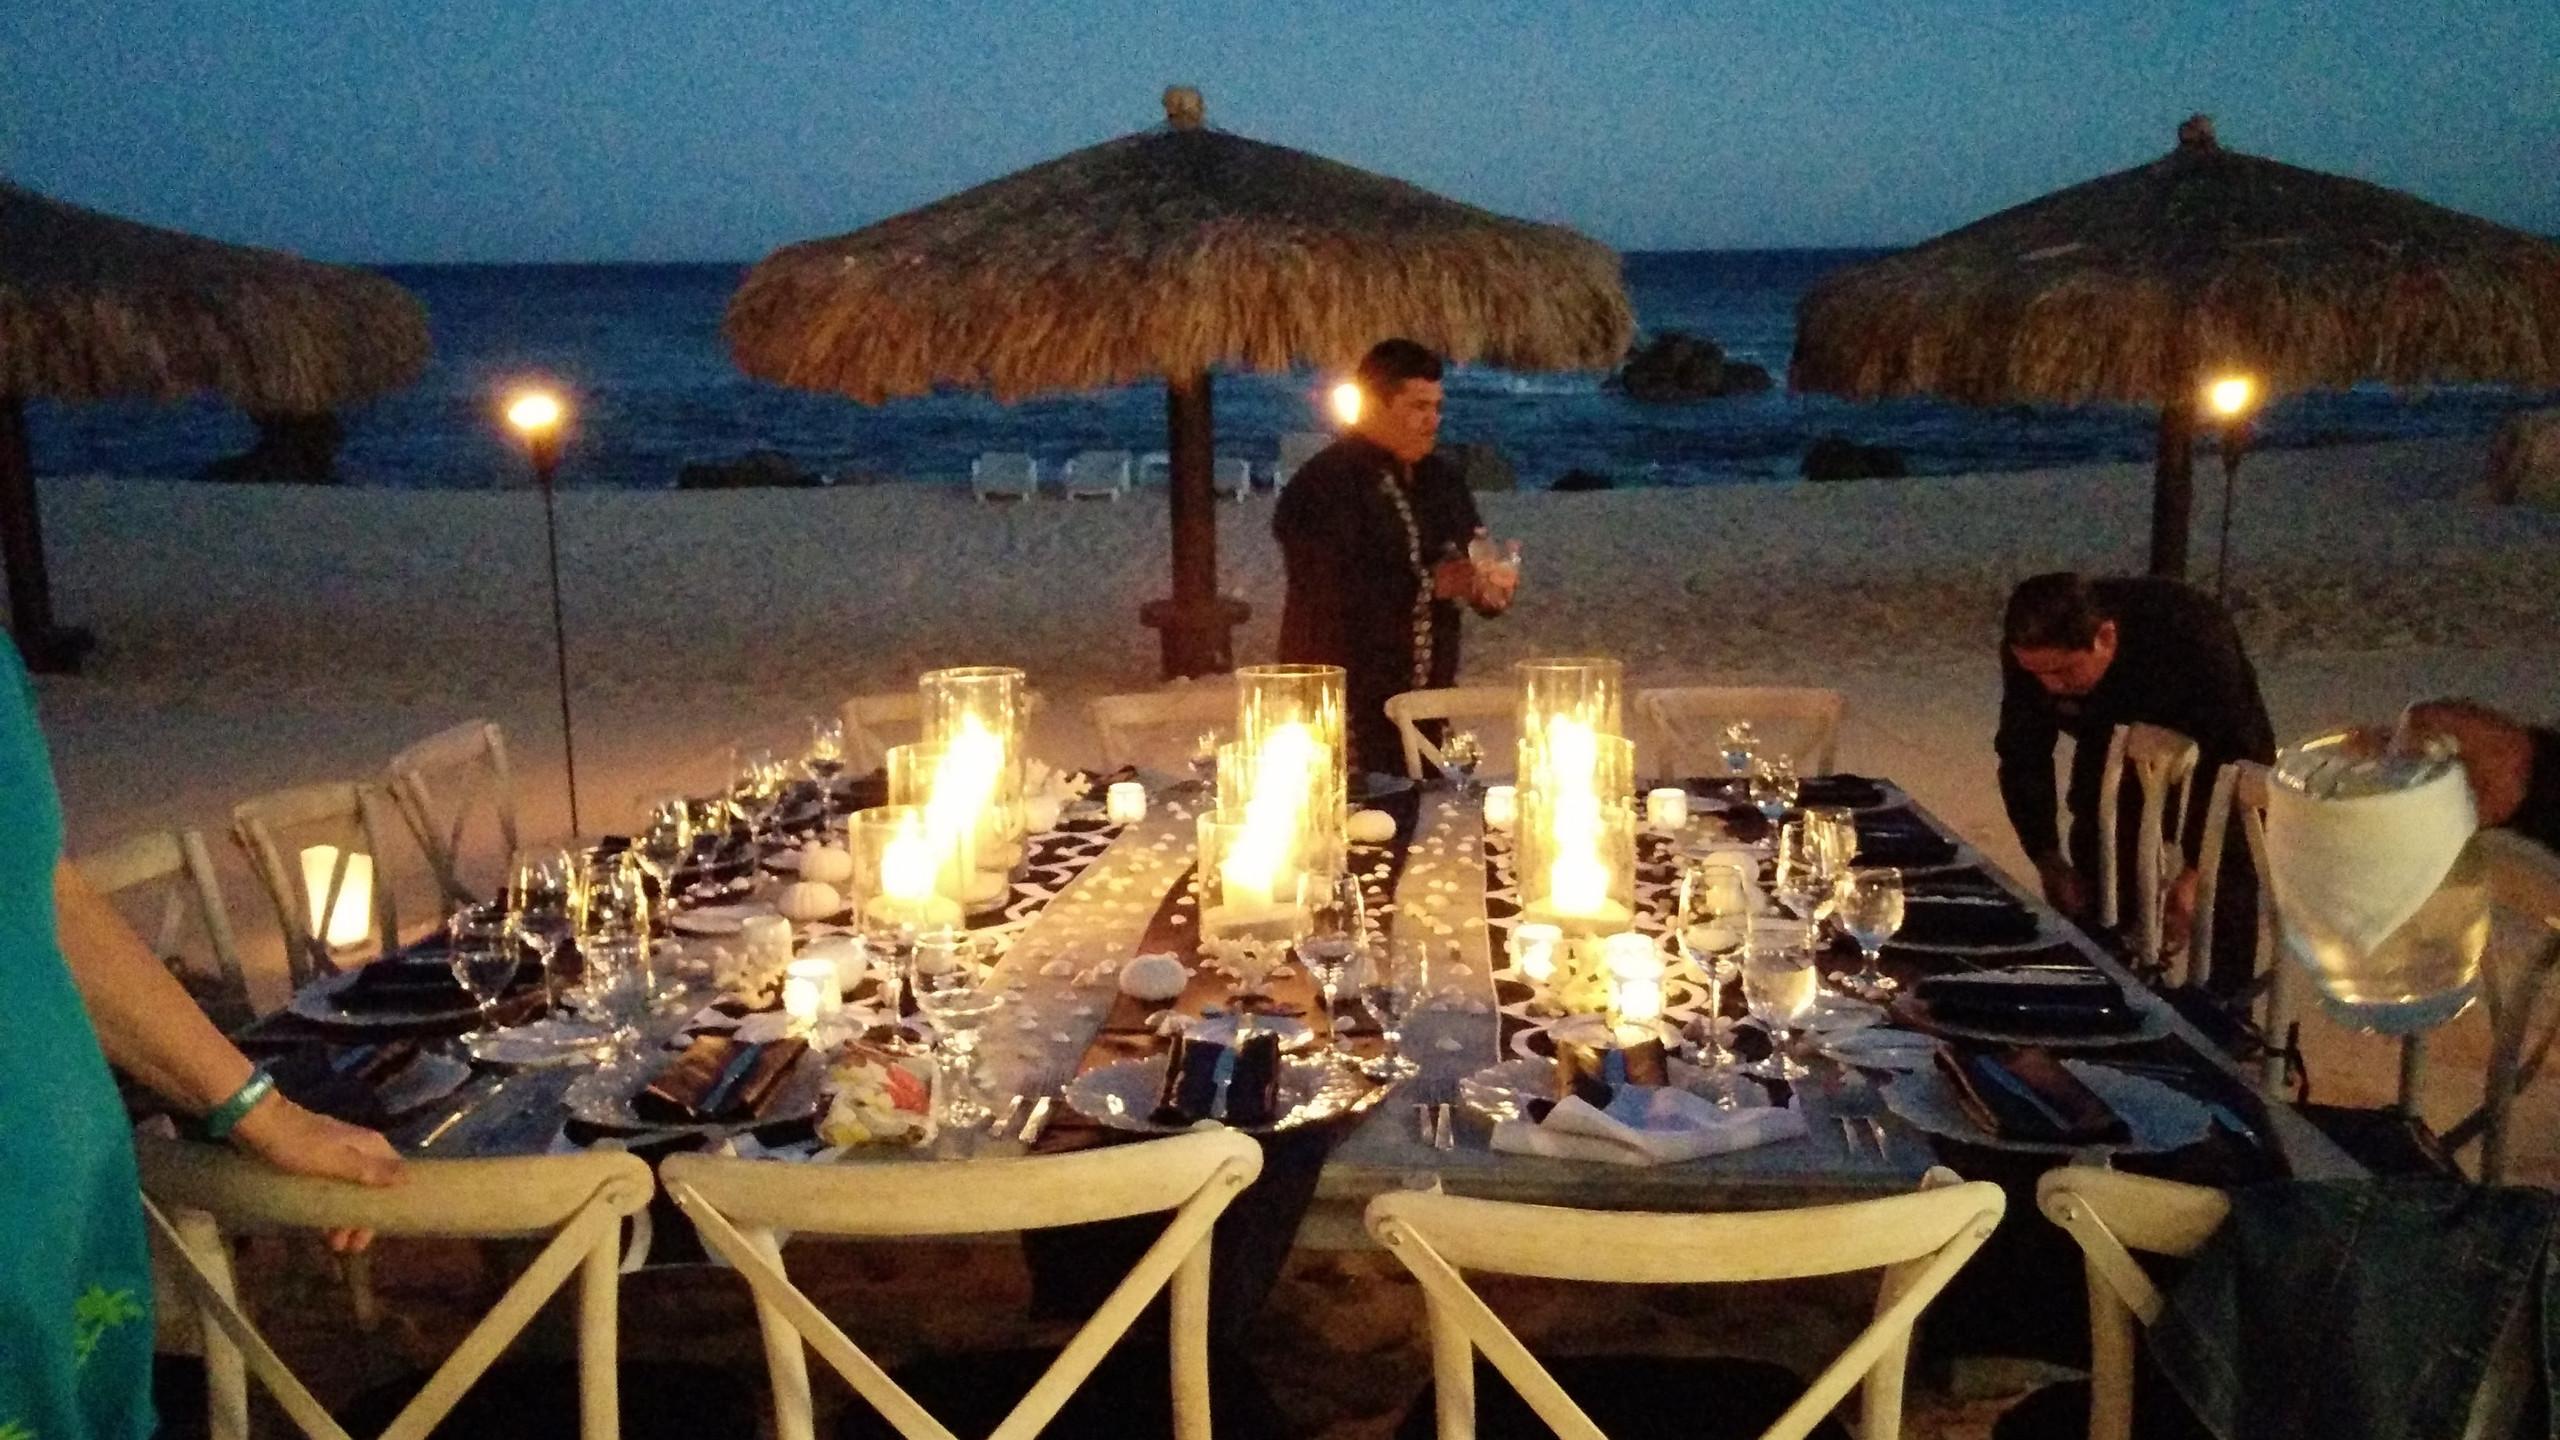 Our final dinner on the beach